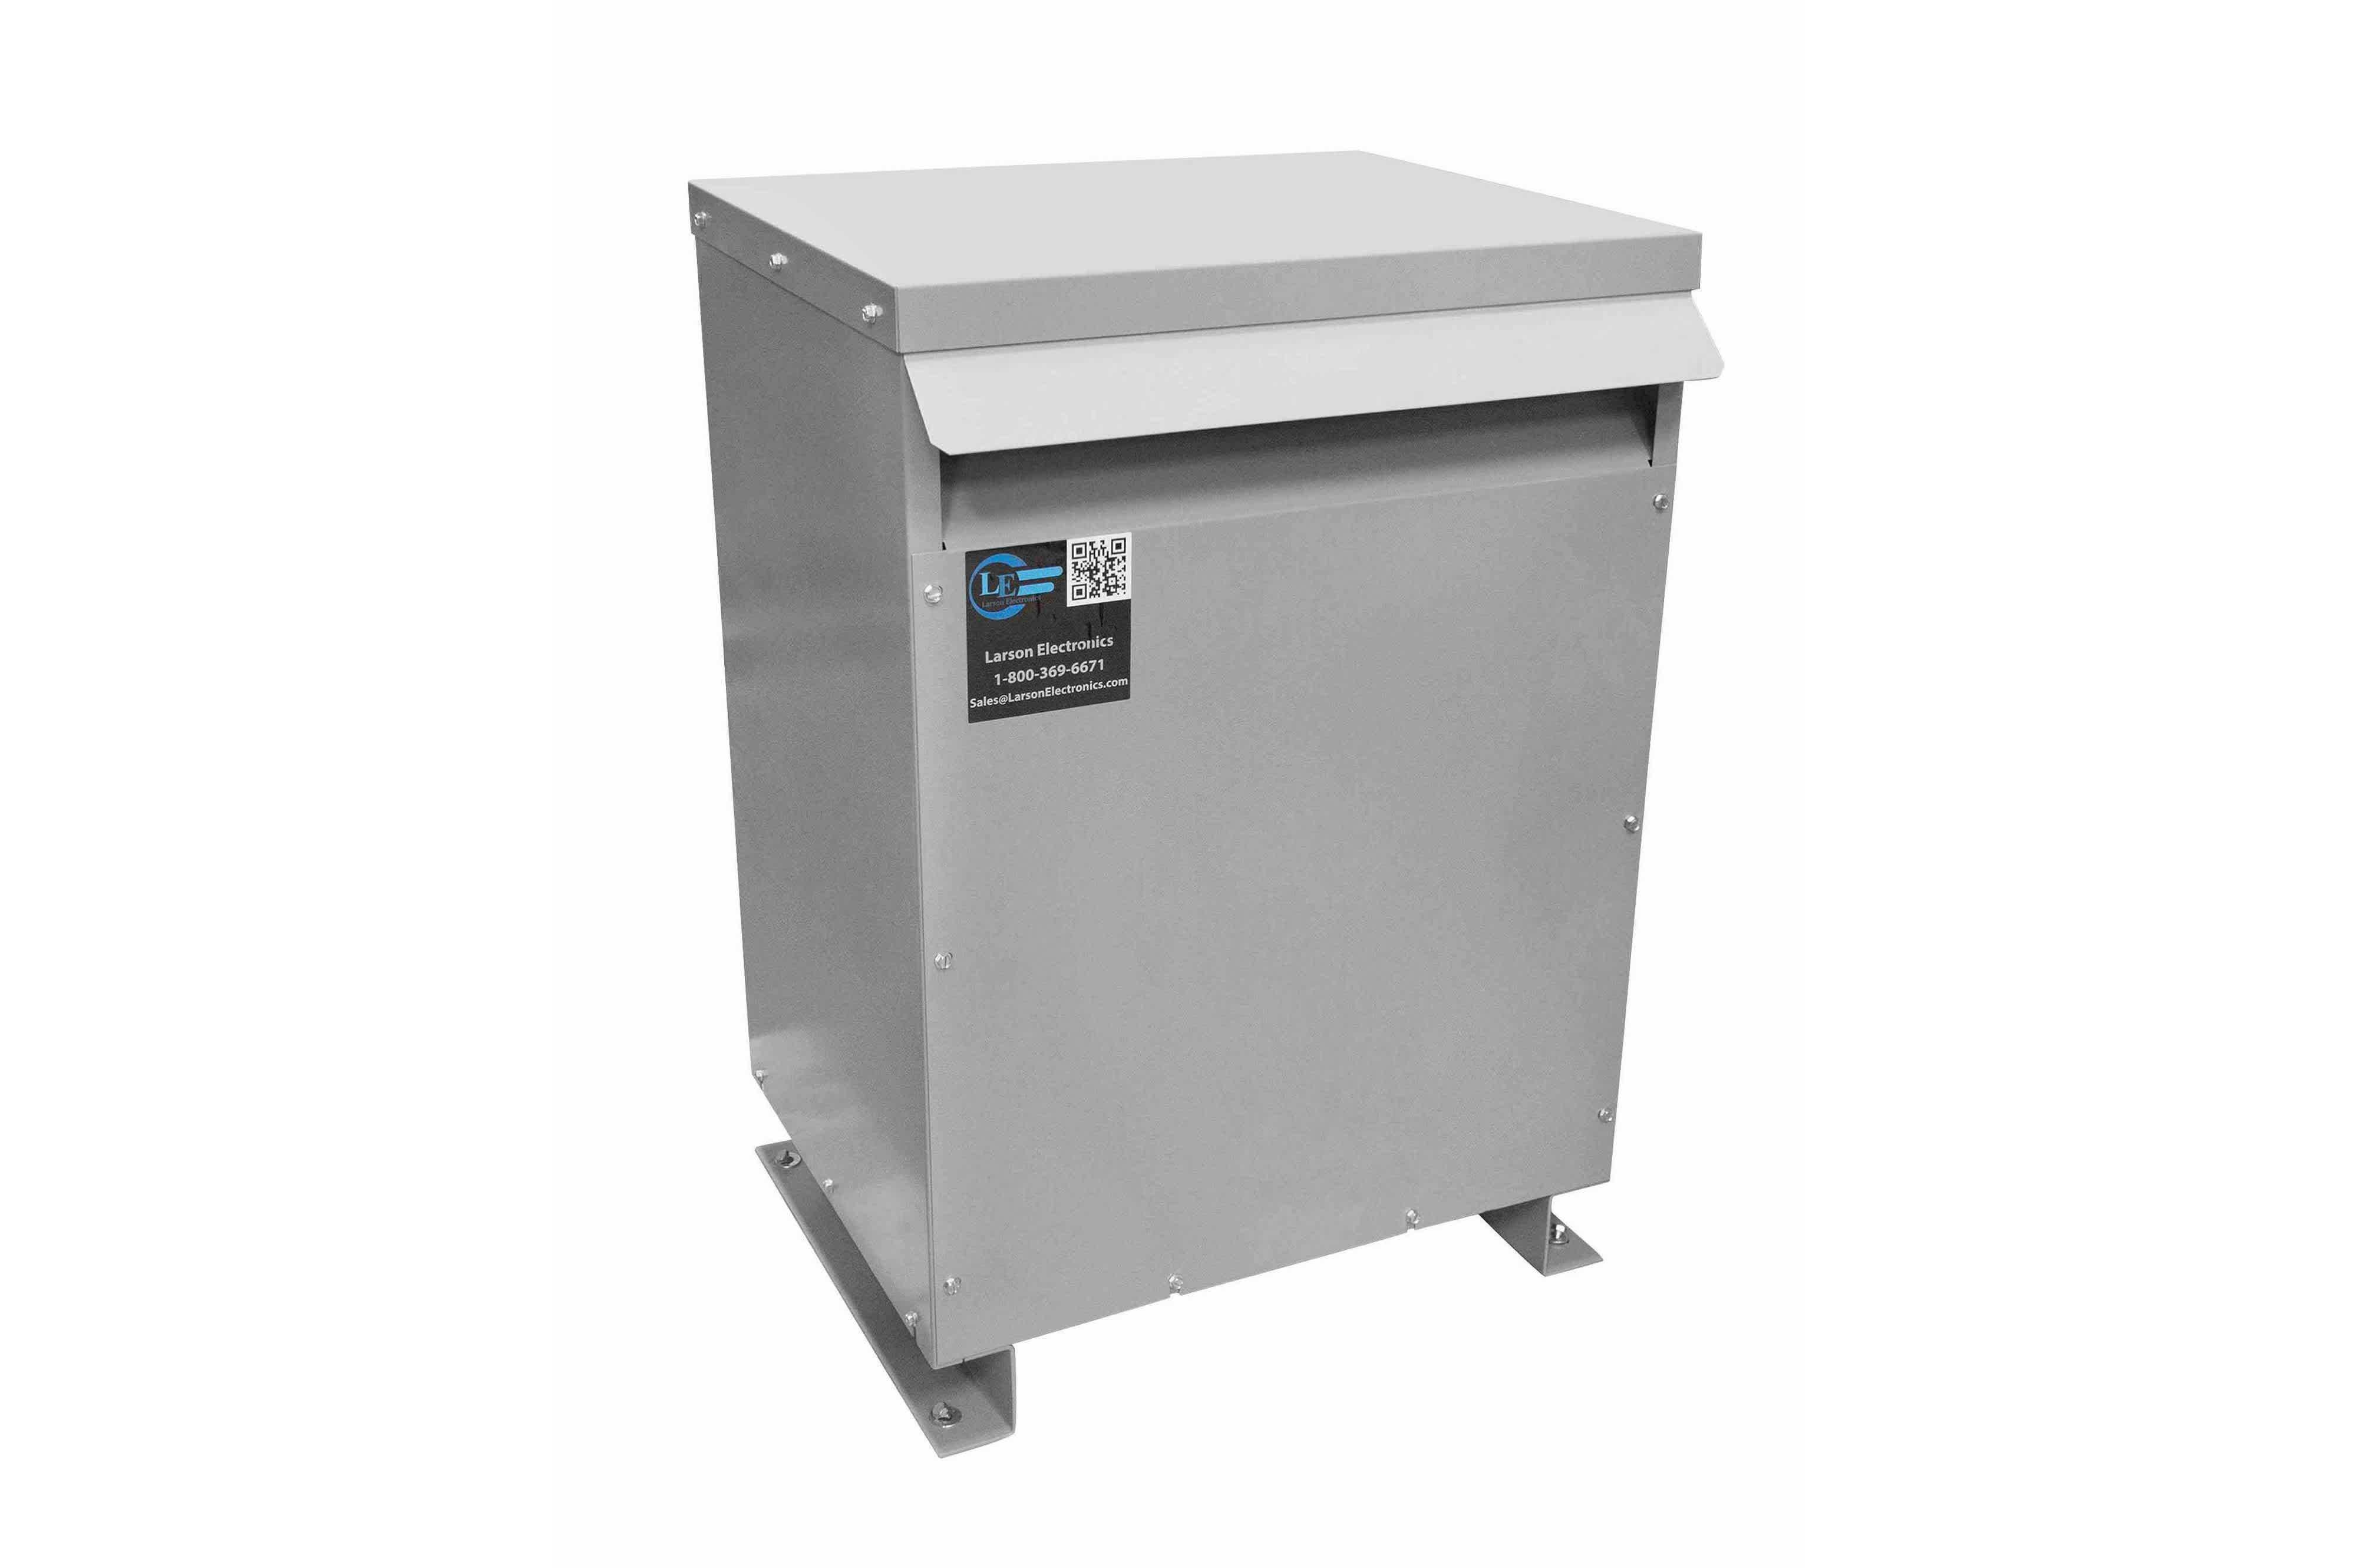 137.5 kVA 3PH Isolation Transformer, 208V Wye Primary, 208V Delta Secondary, N3R, Ventilated, 60 Hz